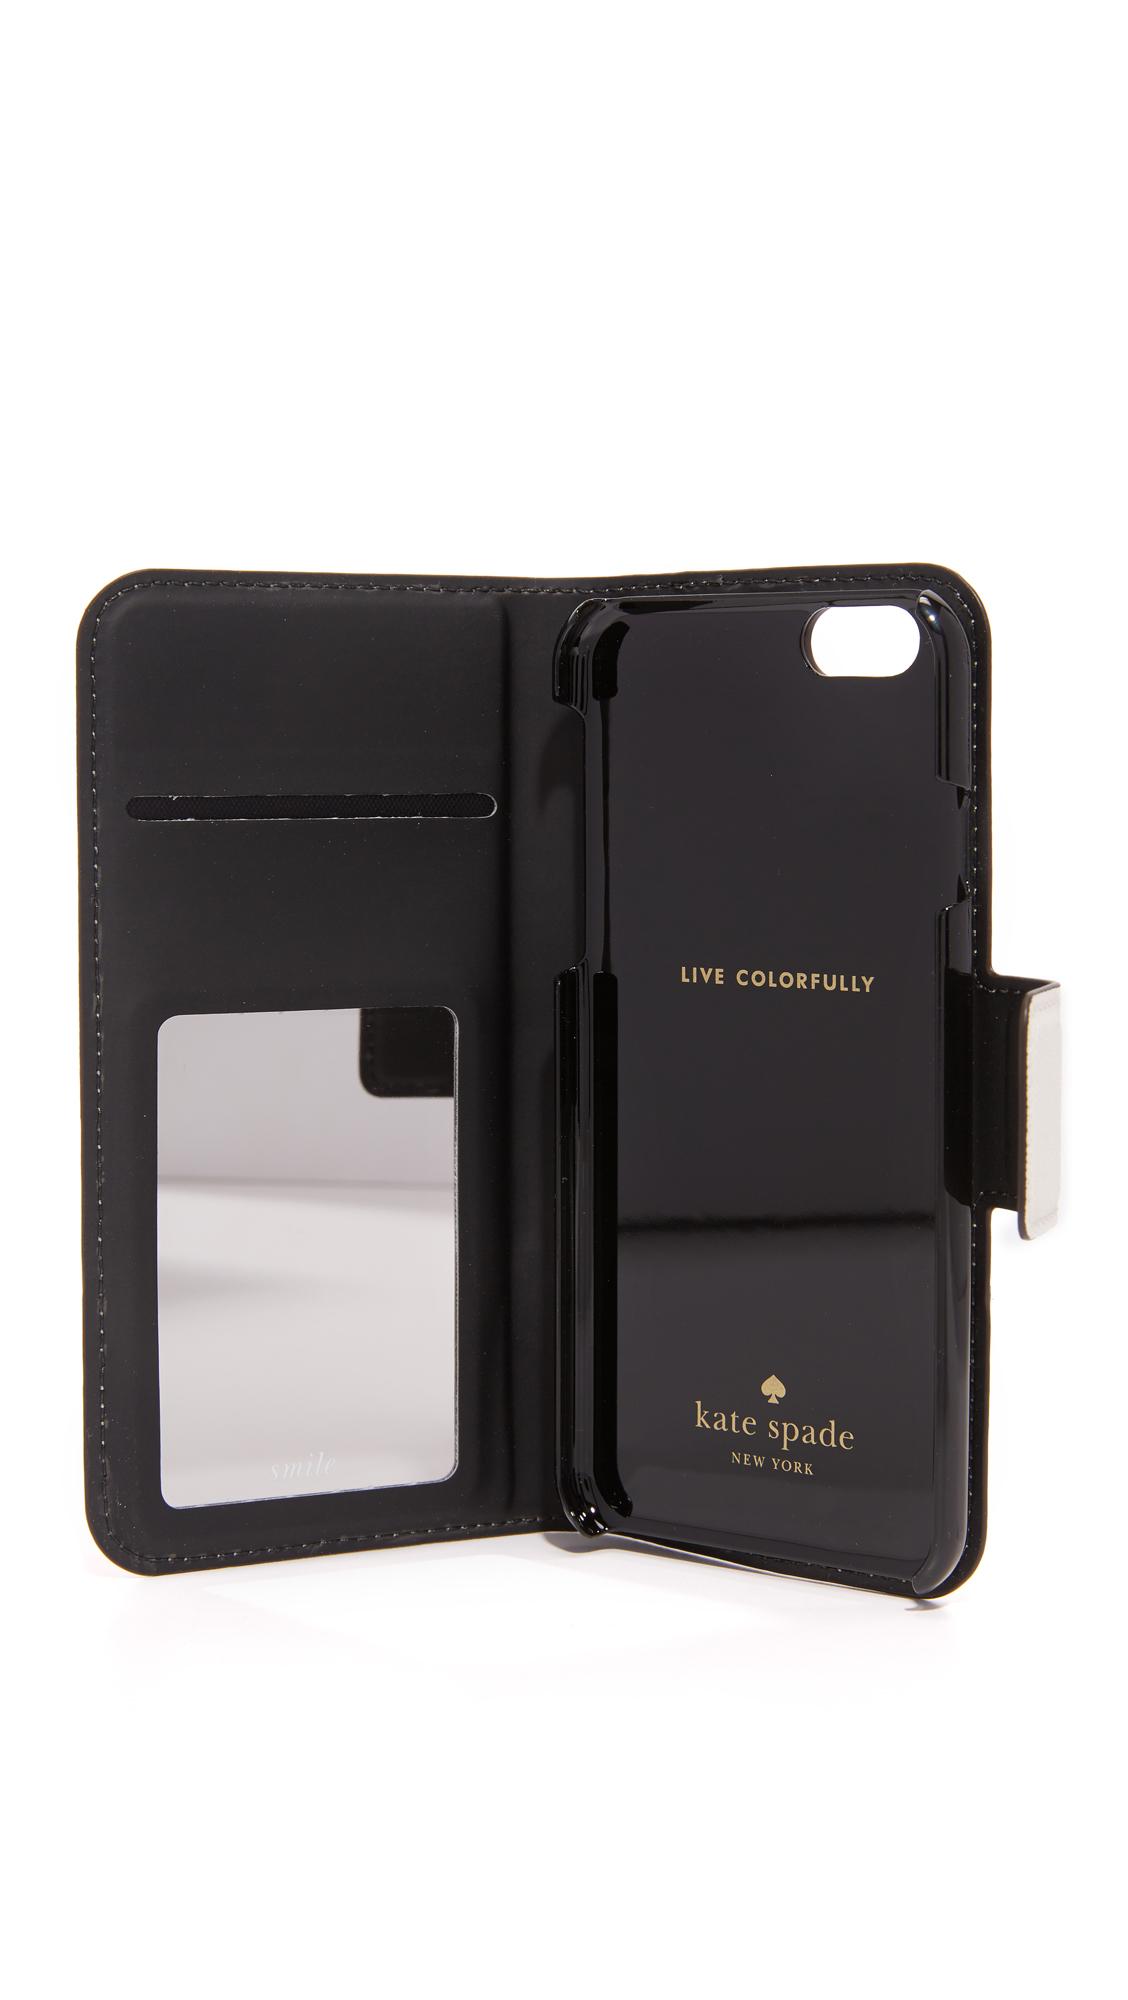 Iphone  Folio Case Kate Spade